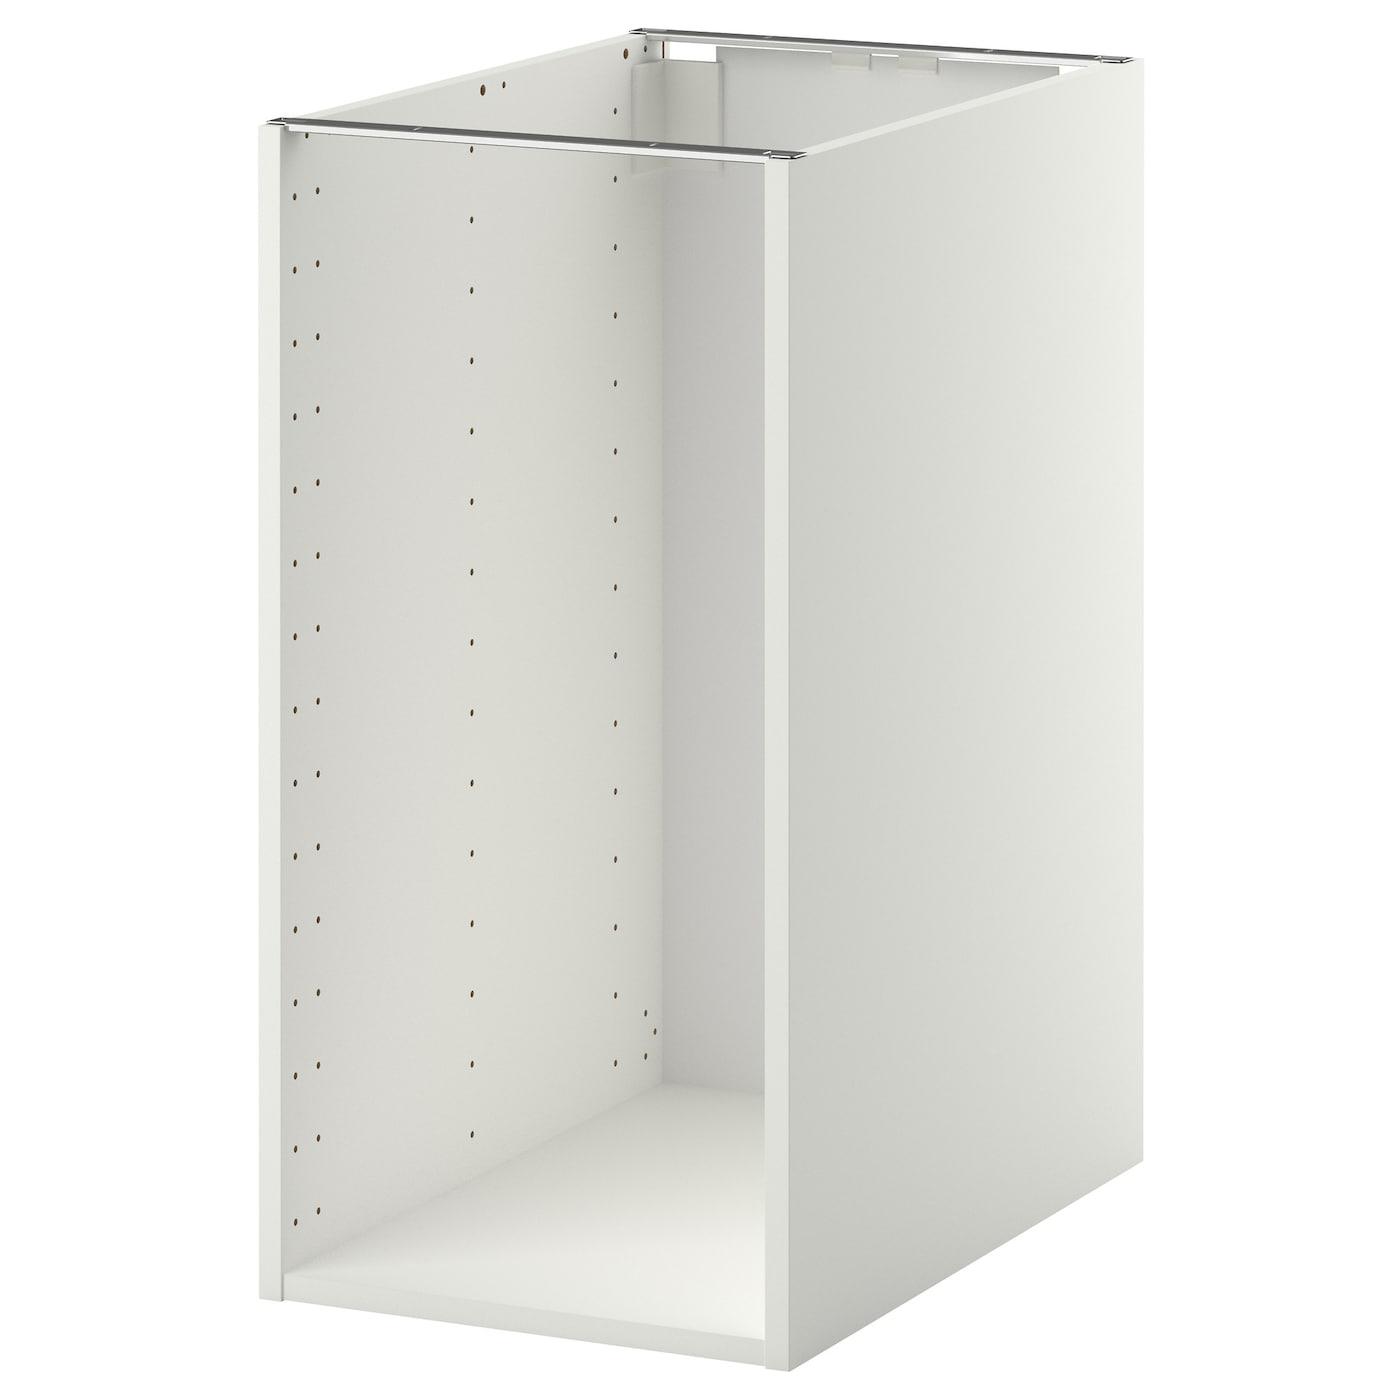 Metod Onderkast Basiselement Wit 40x60x80 Cm Ikea